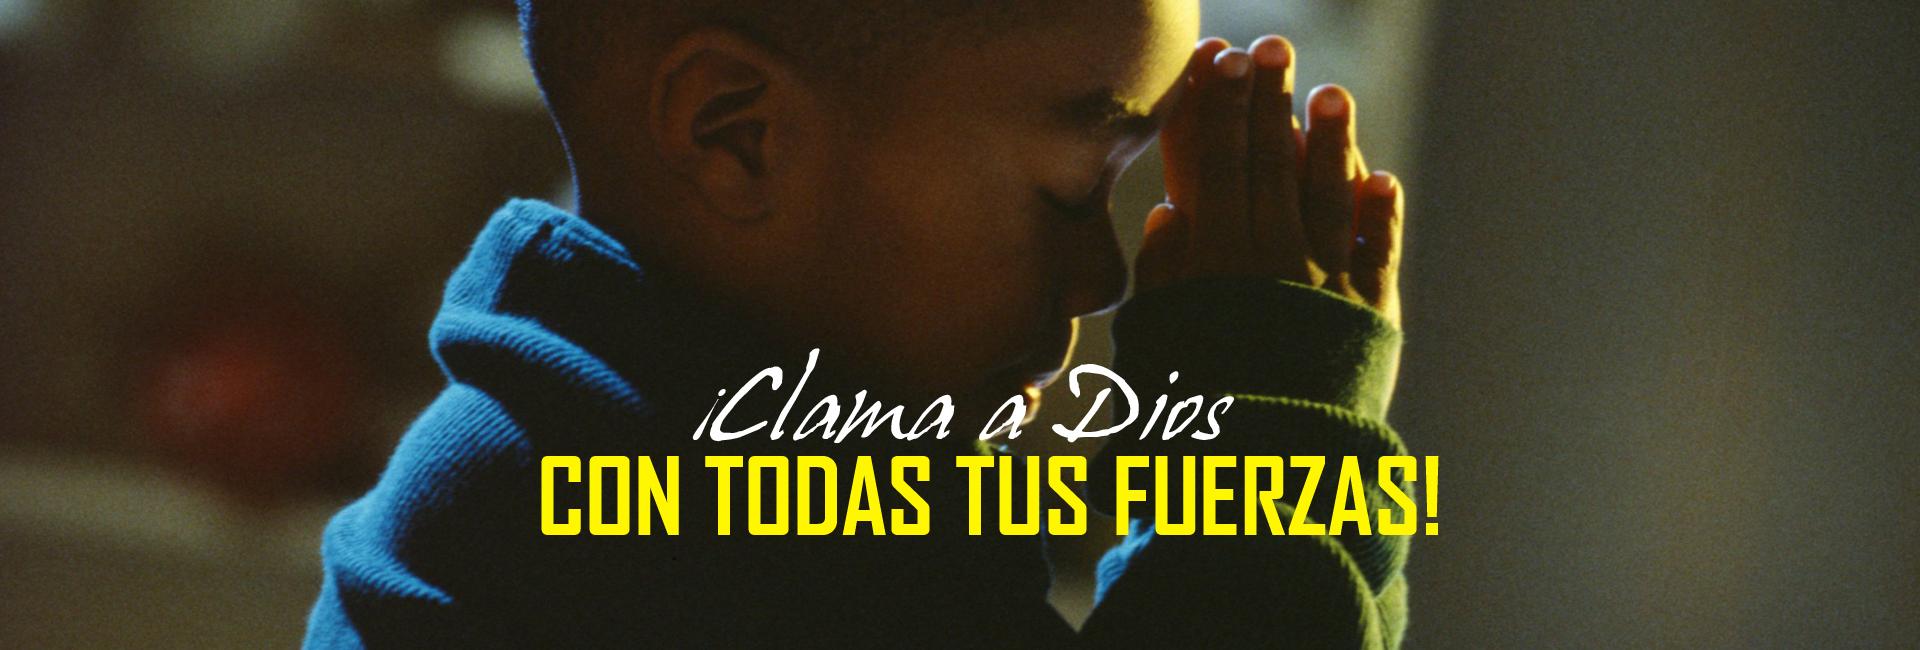 Slide Clama a Dios